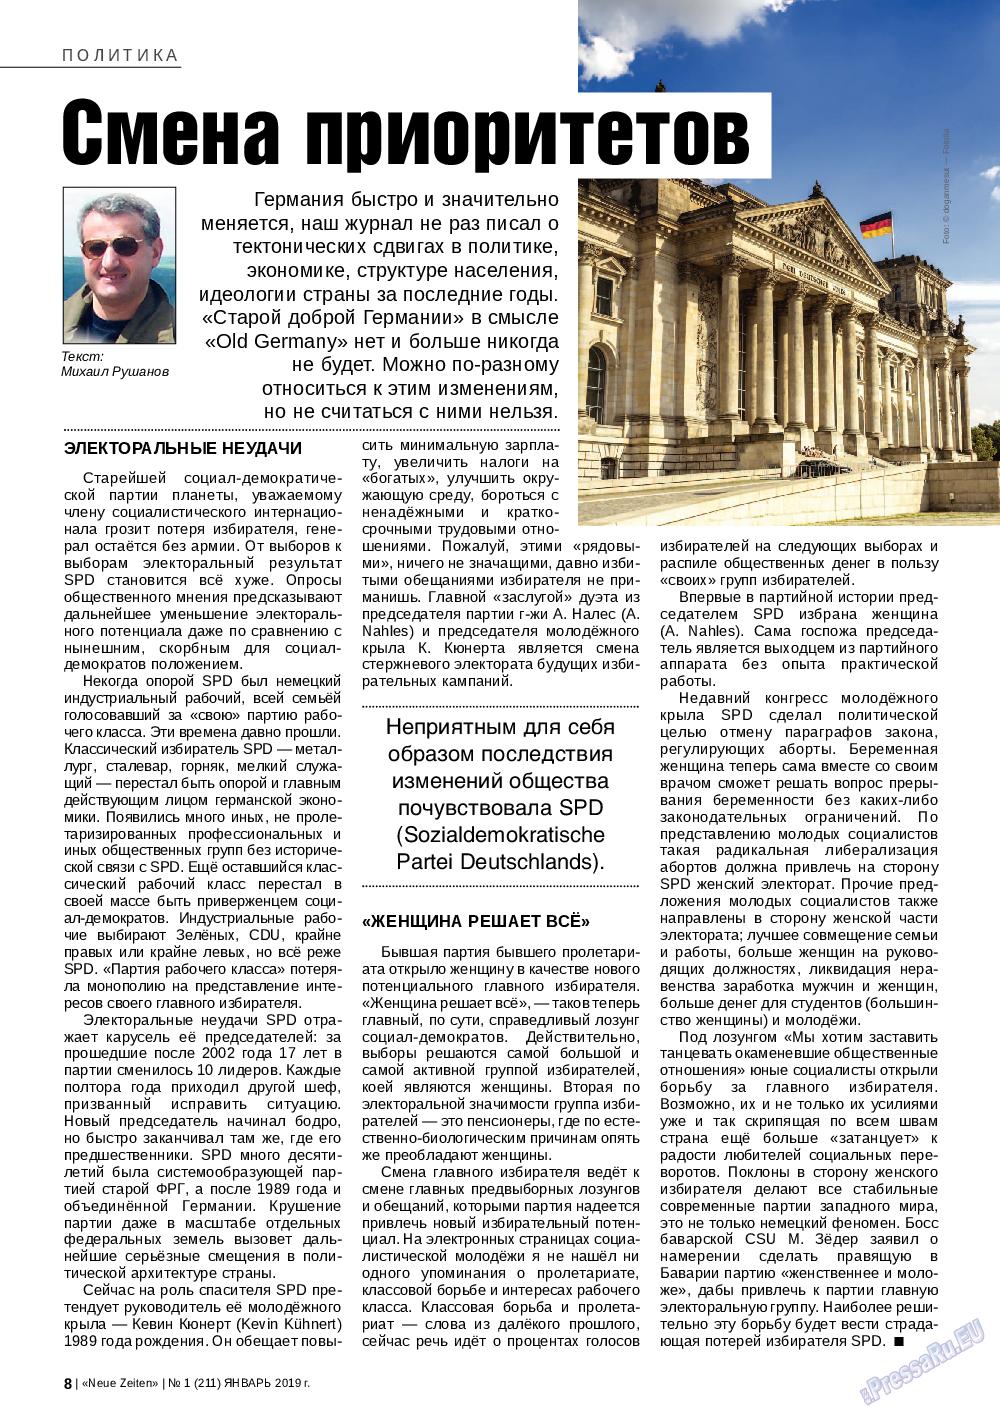 Neue Zeiten (журнал). 2019 год, номер 1, стр. 8